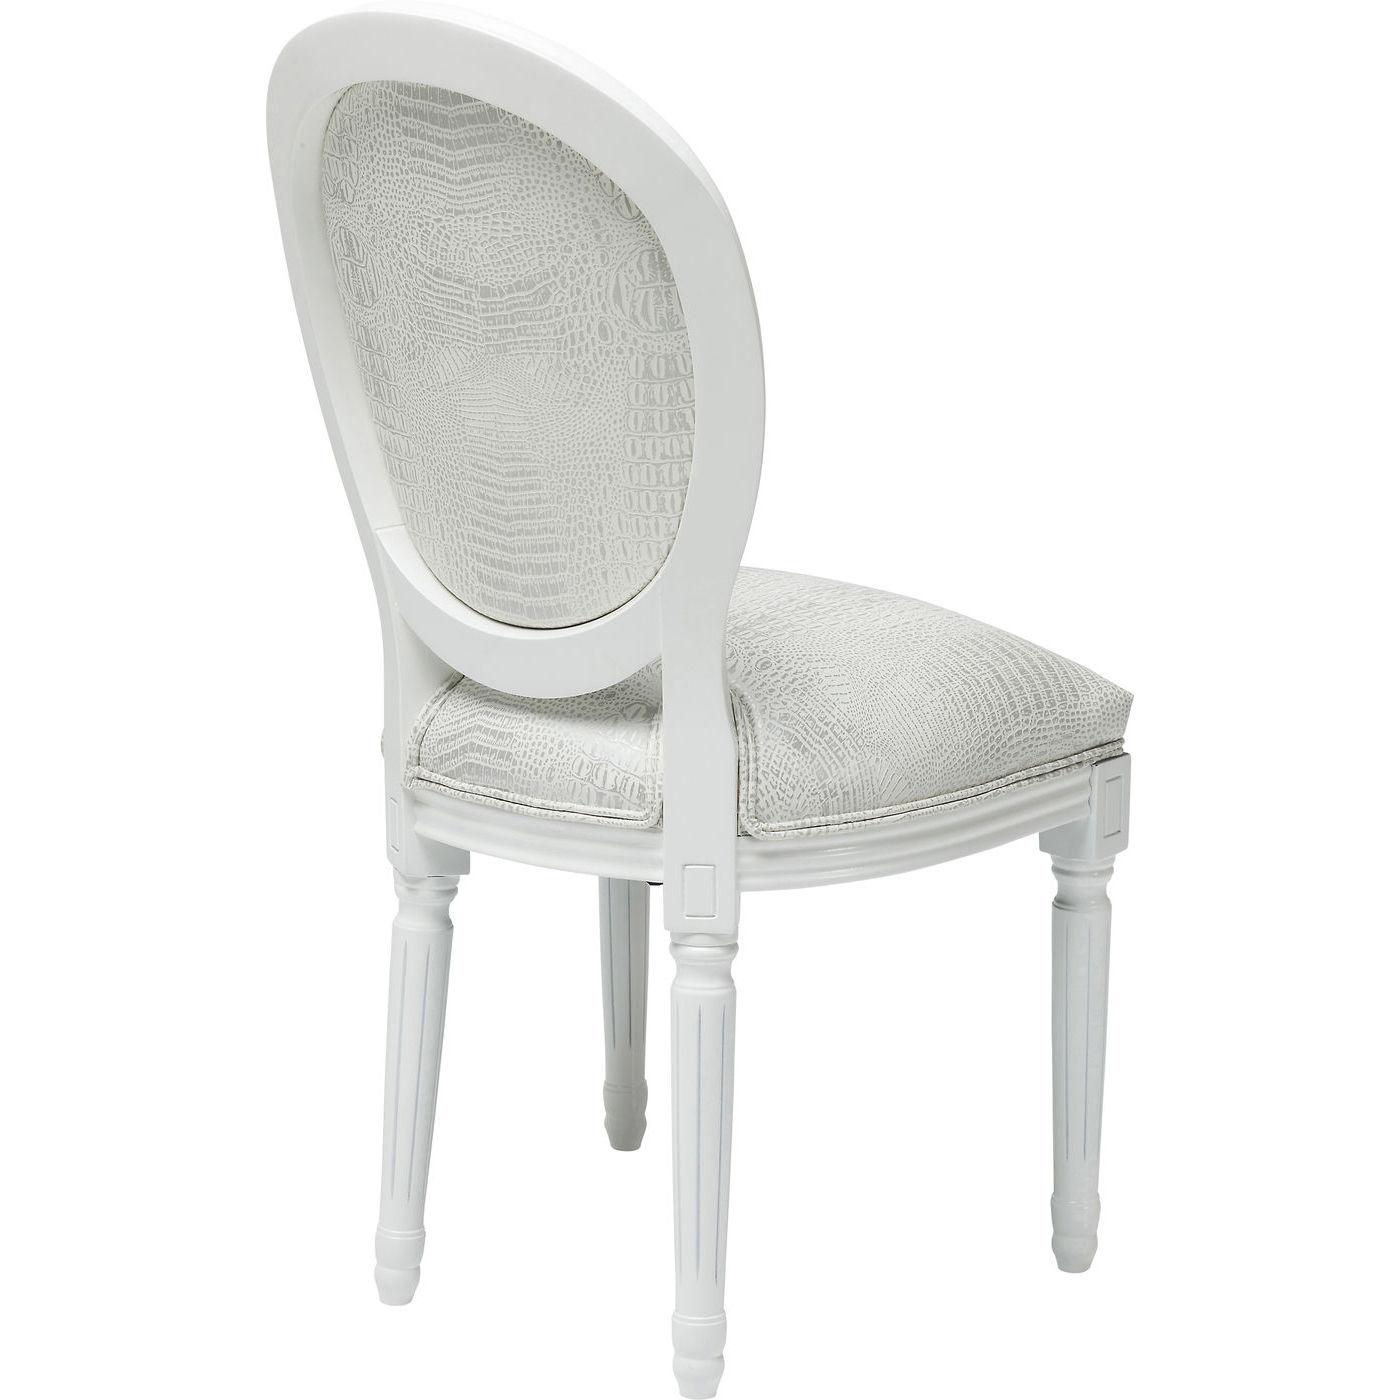 kare design stuhl louis stuhl polsterstuhl barockstuhl louis seize kroko wei neu